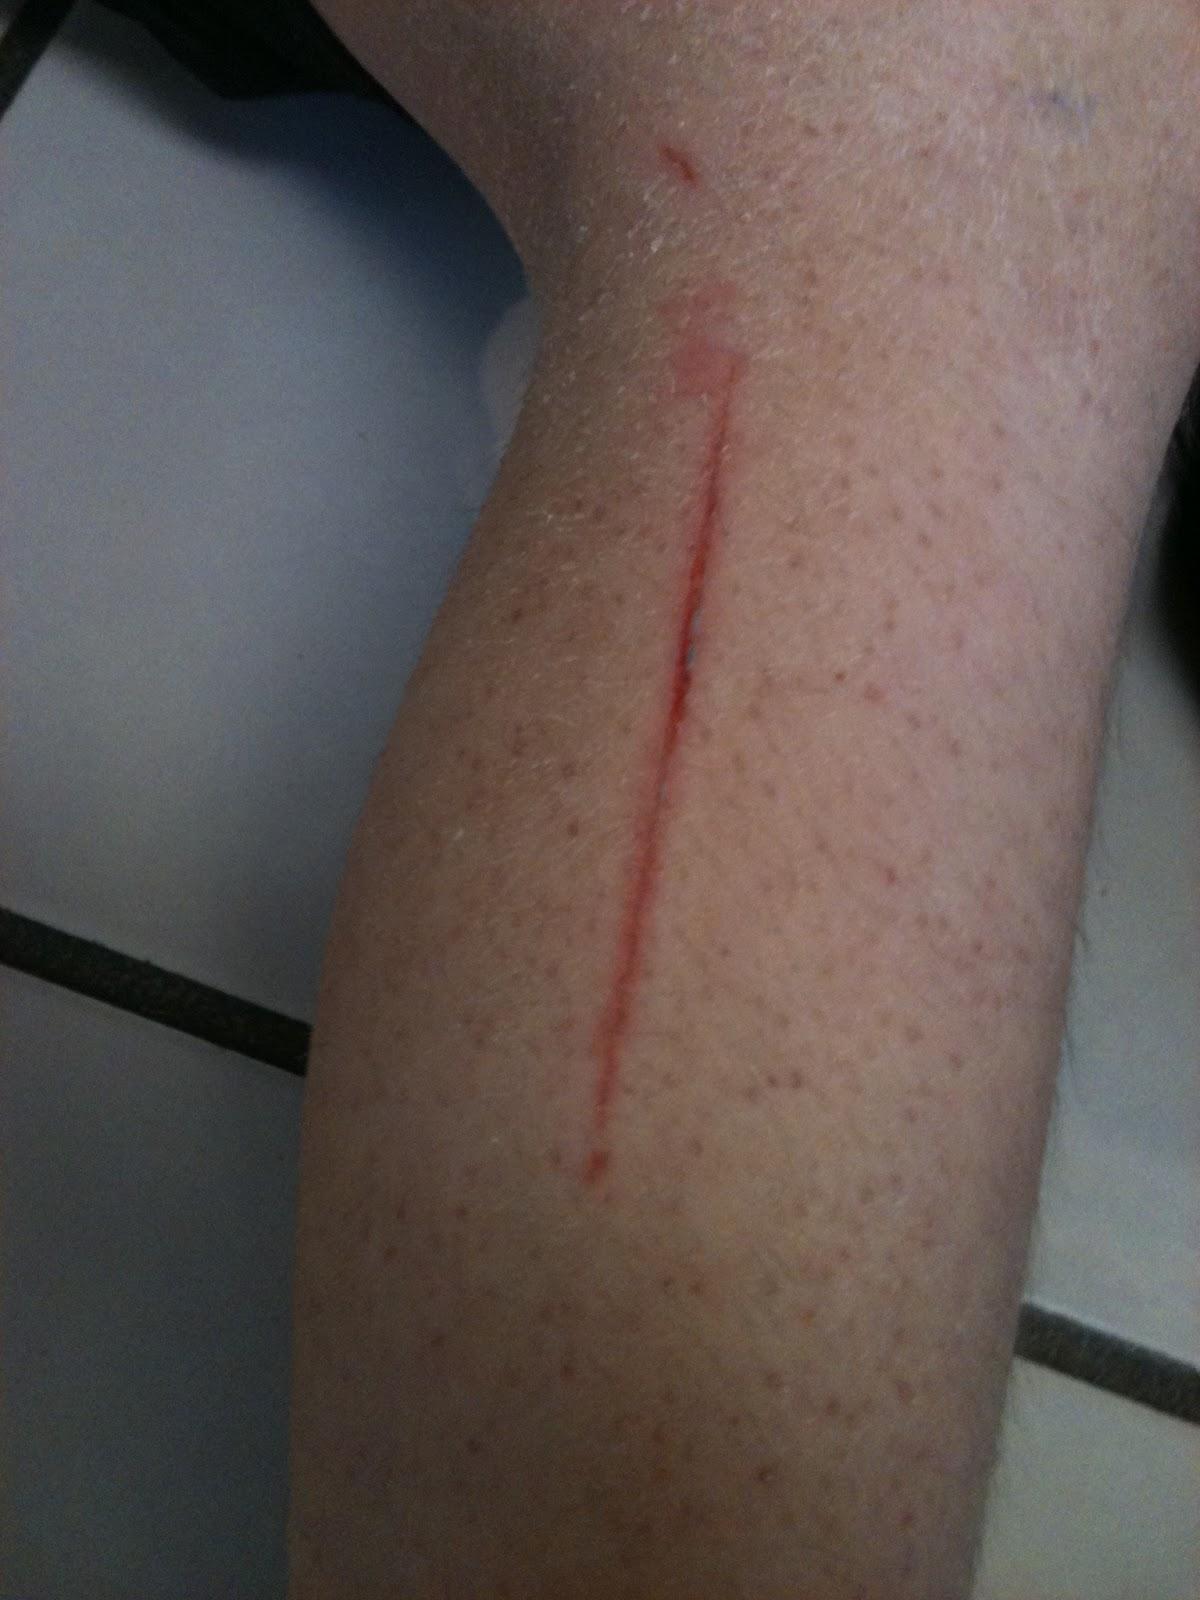 cast saws can cut skin amber argyle